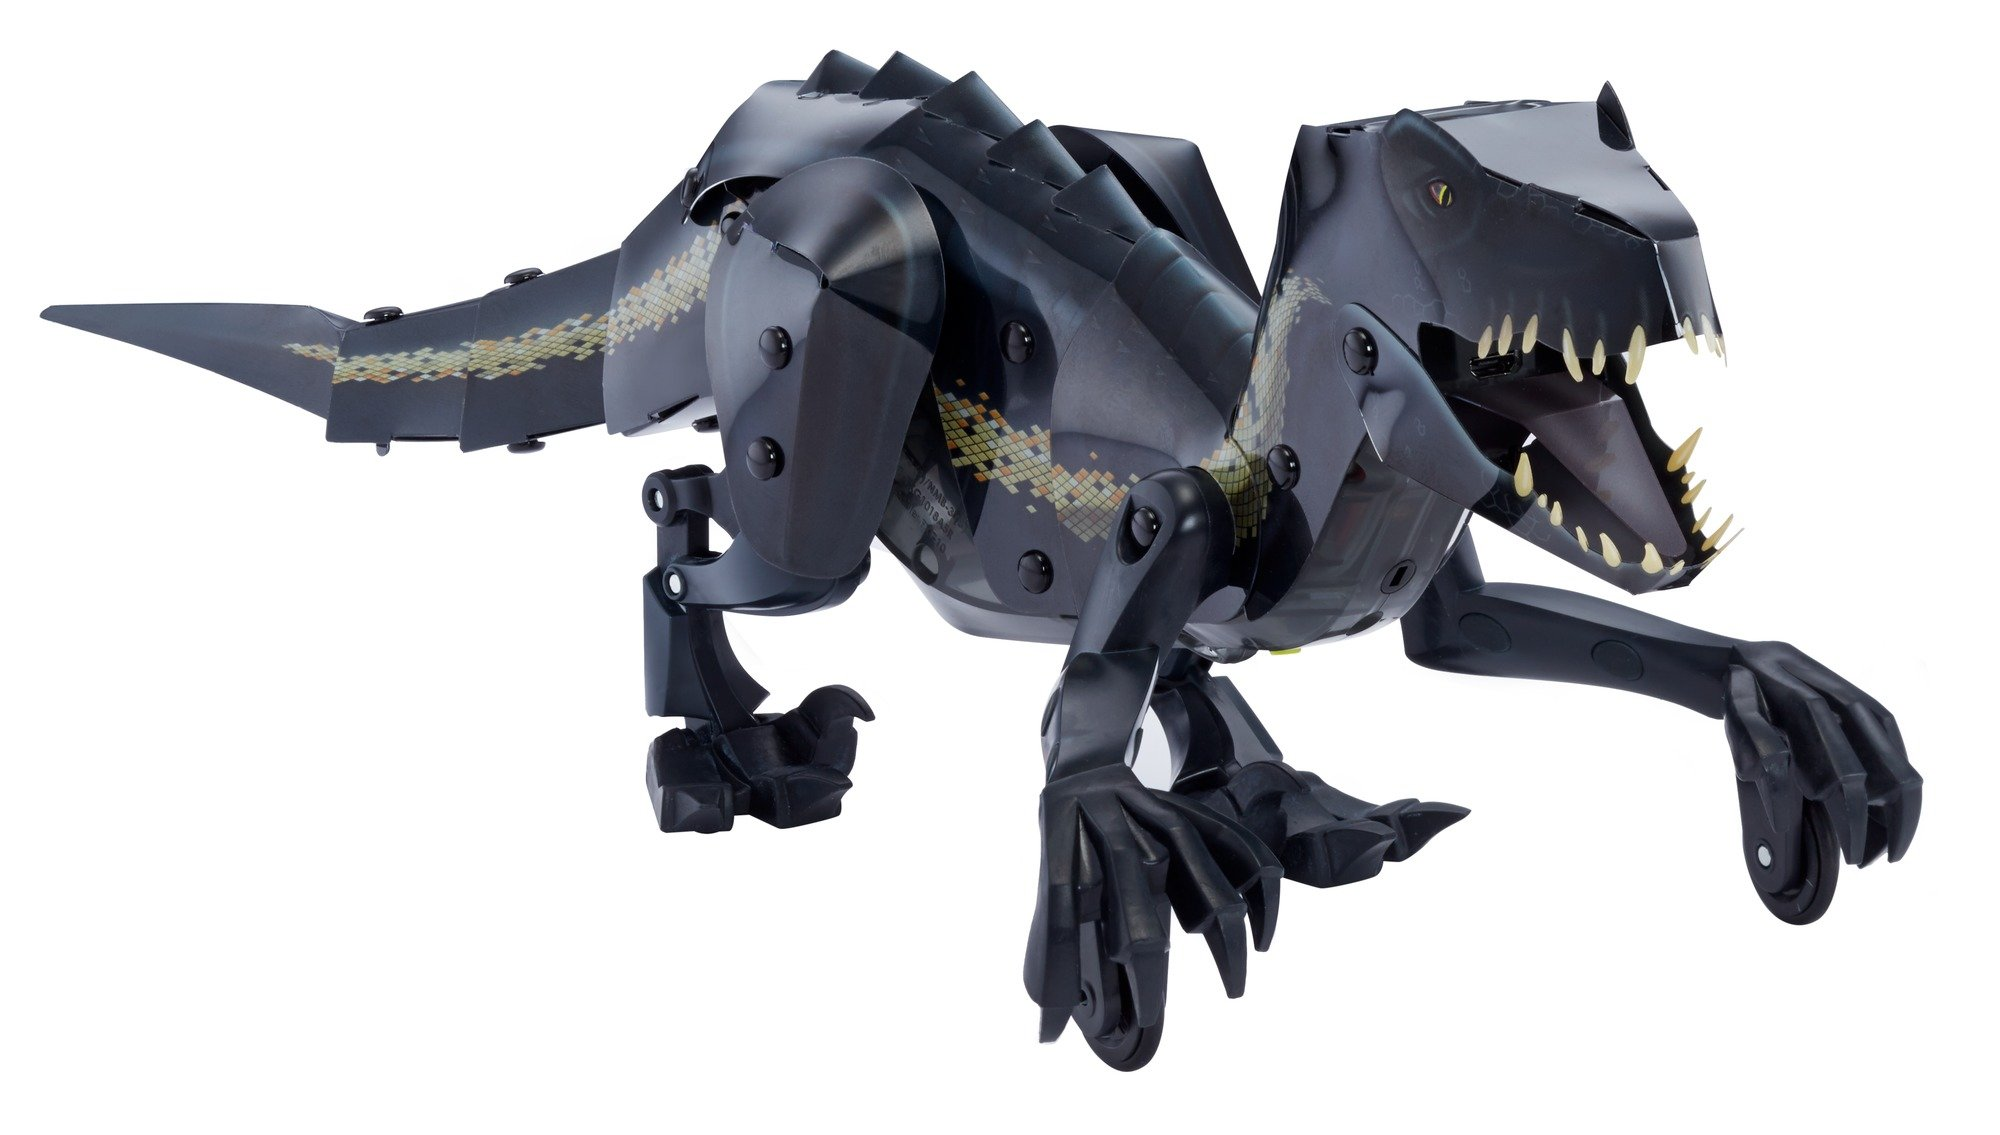 Kamigami Jurassic World Indoraptor Robot